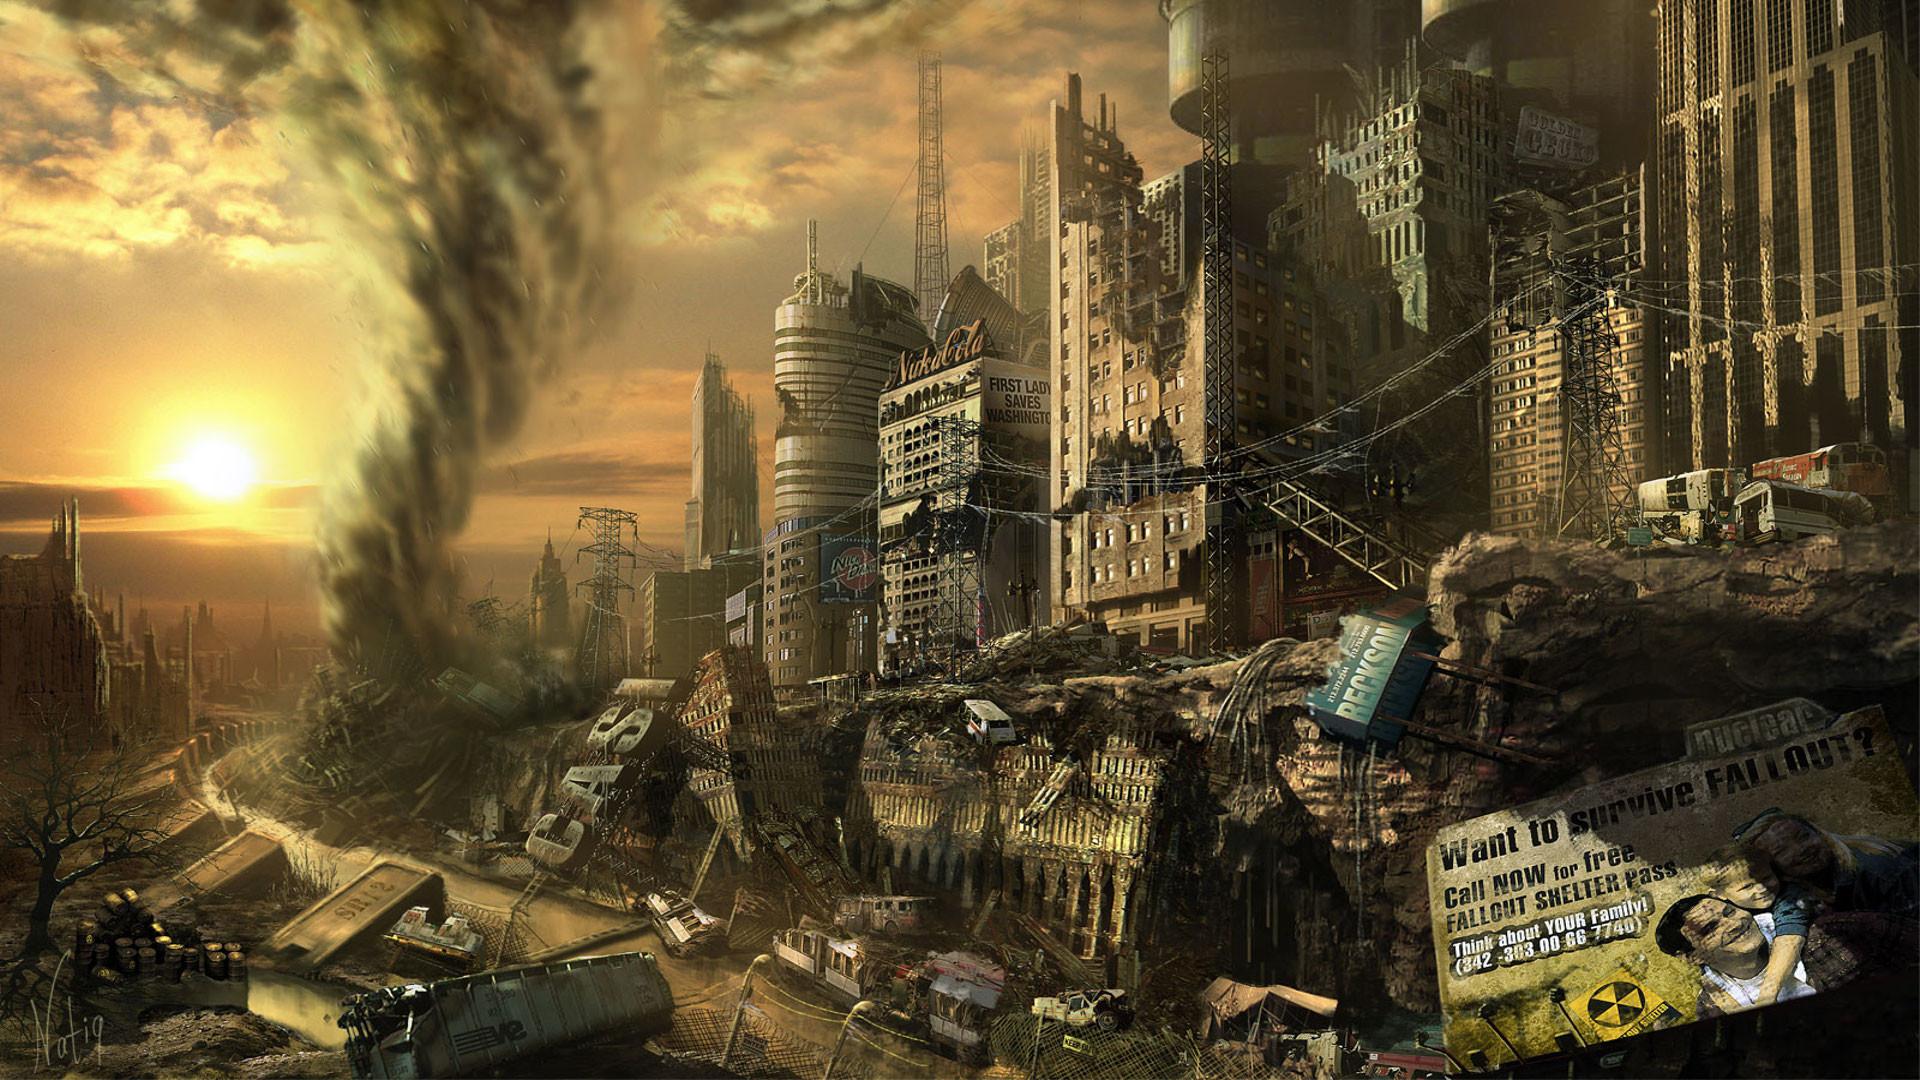 Fallout Hd Wallpaper Fallout, Hd